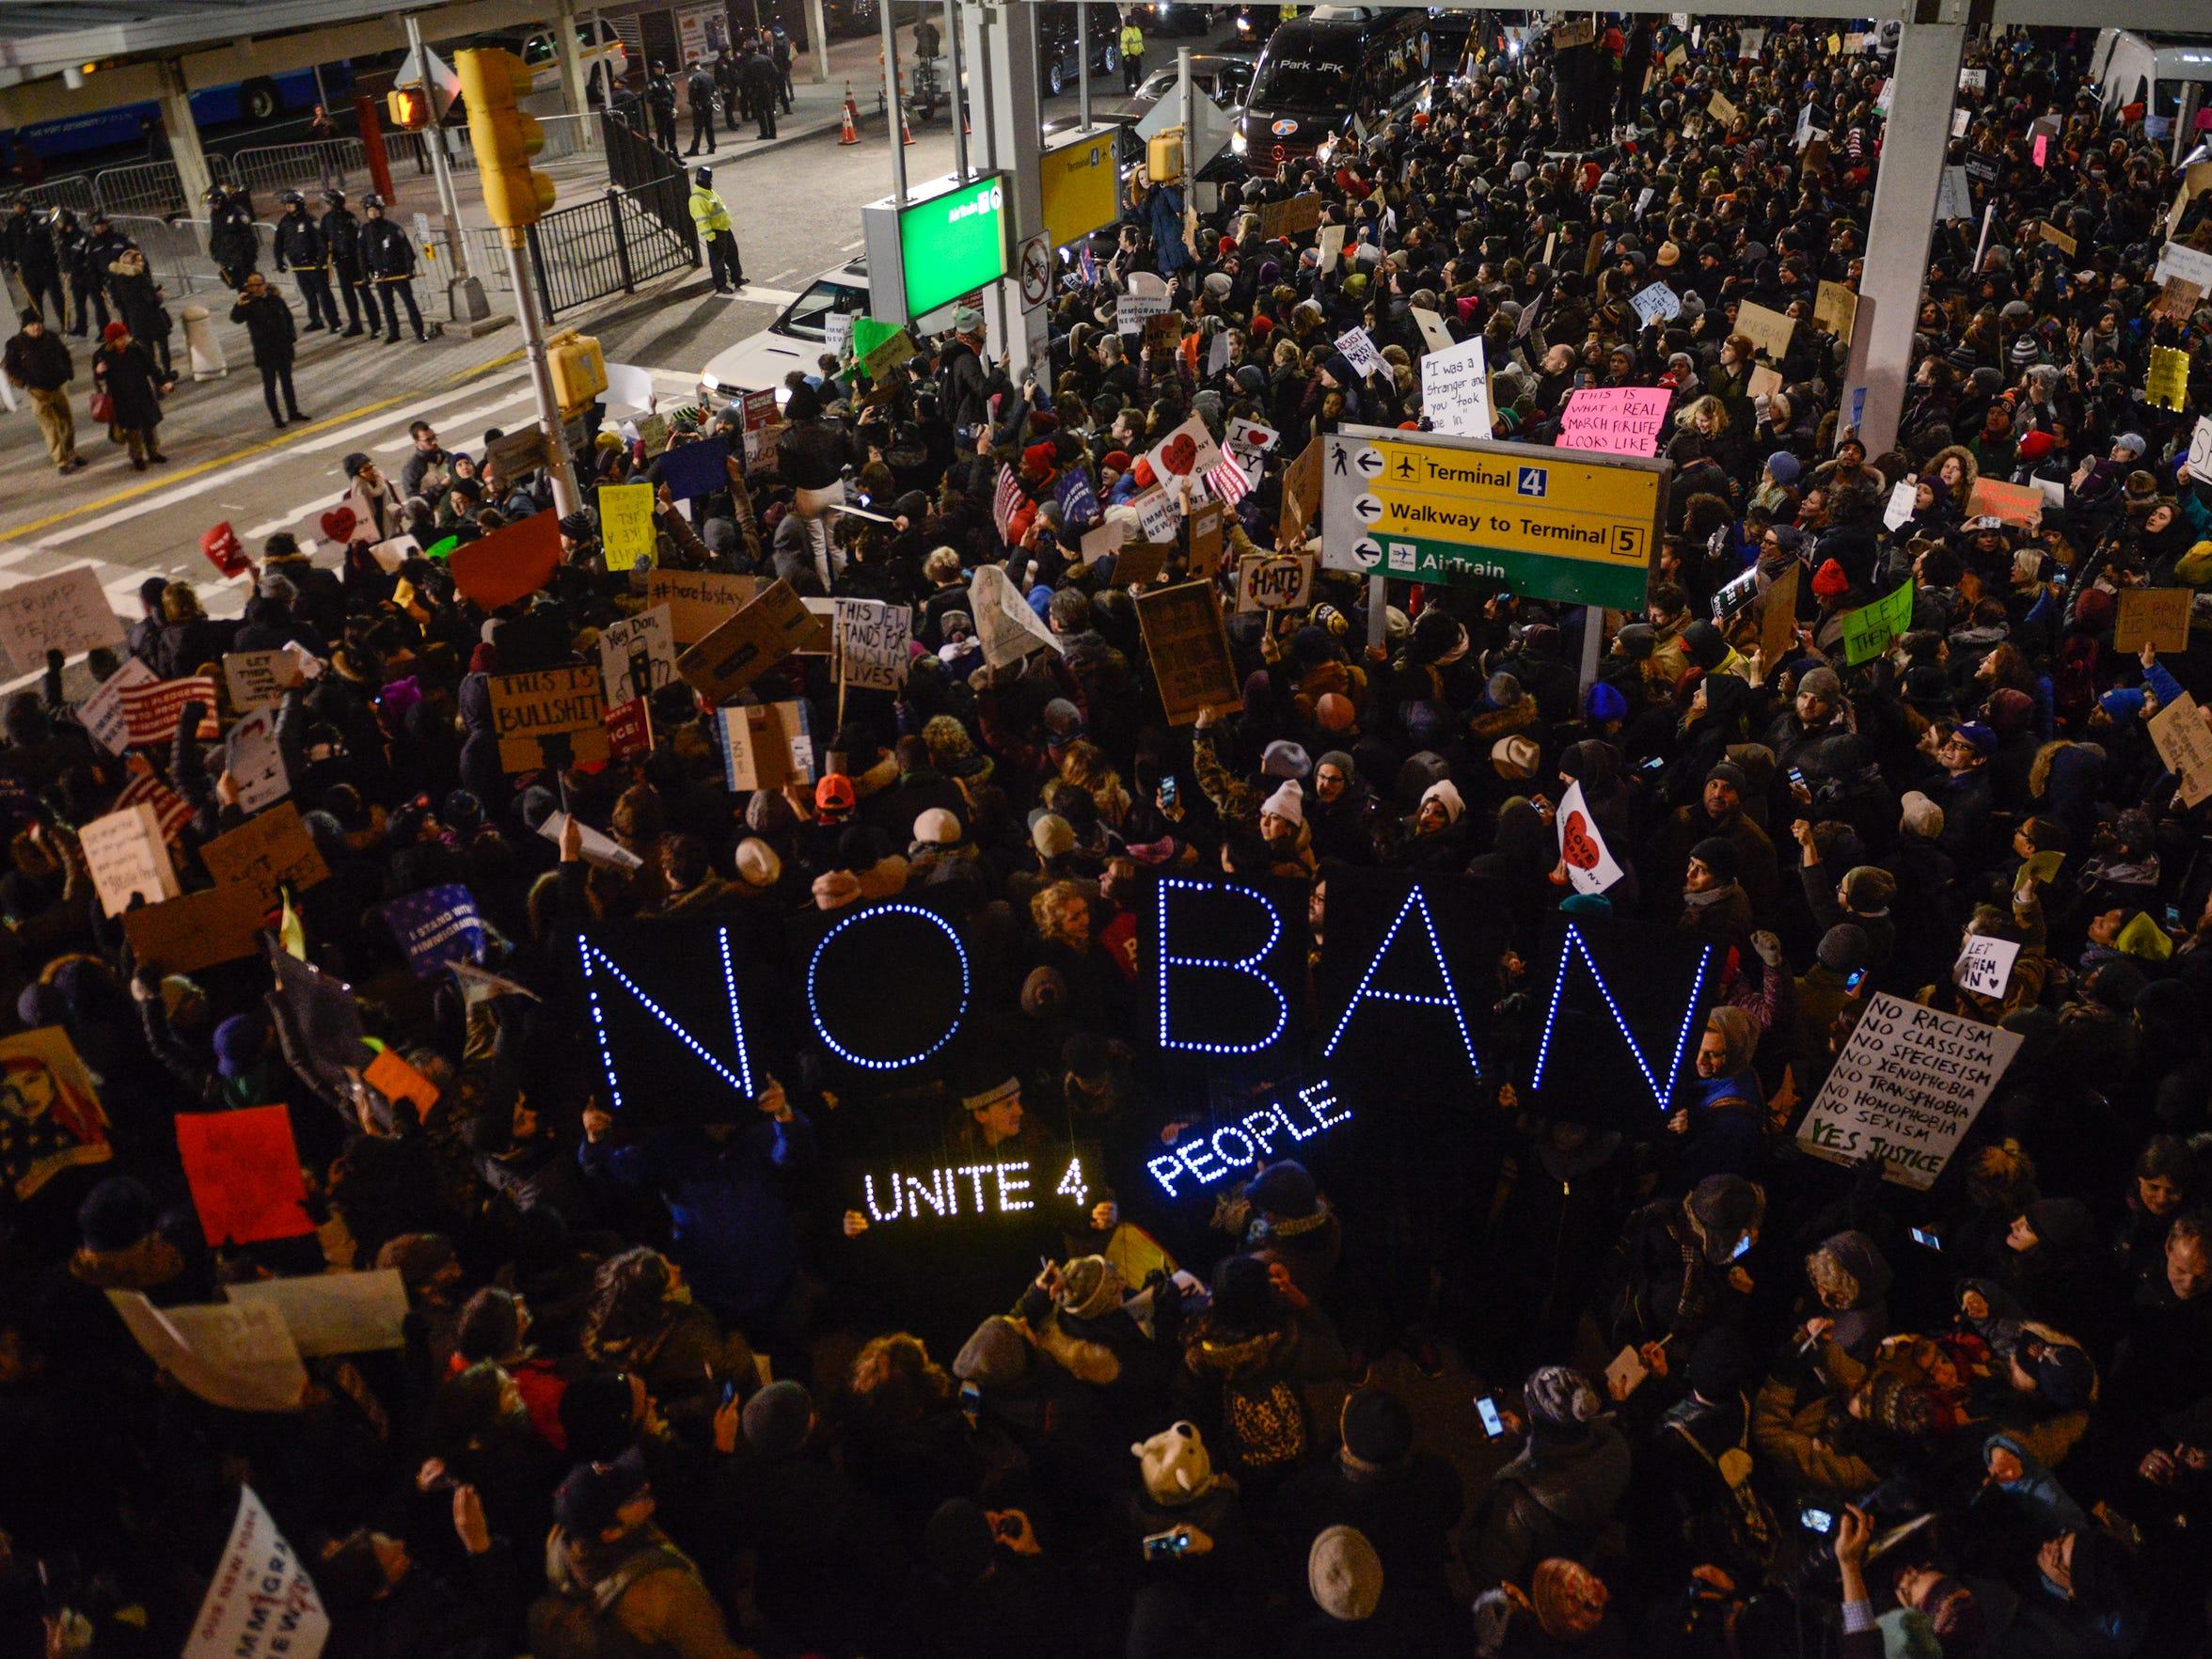 Demonstrators at John F. Kennedy International Airport